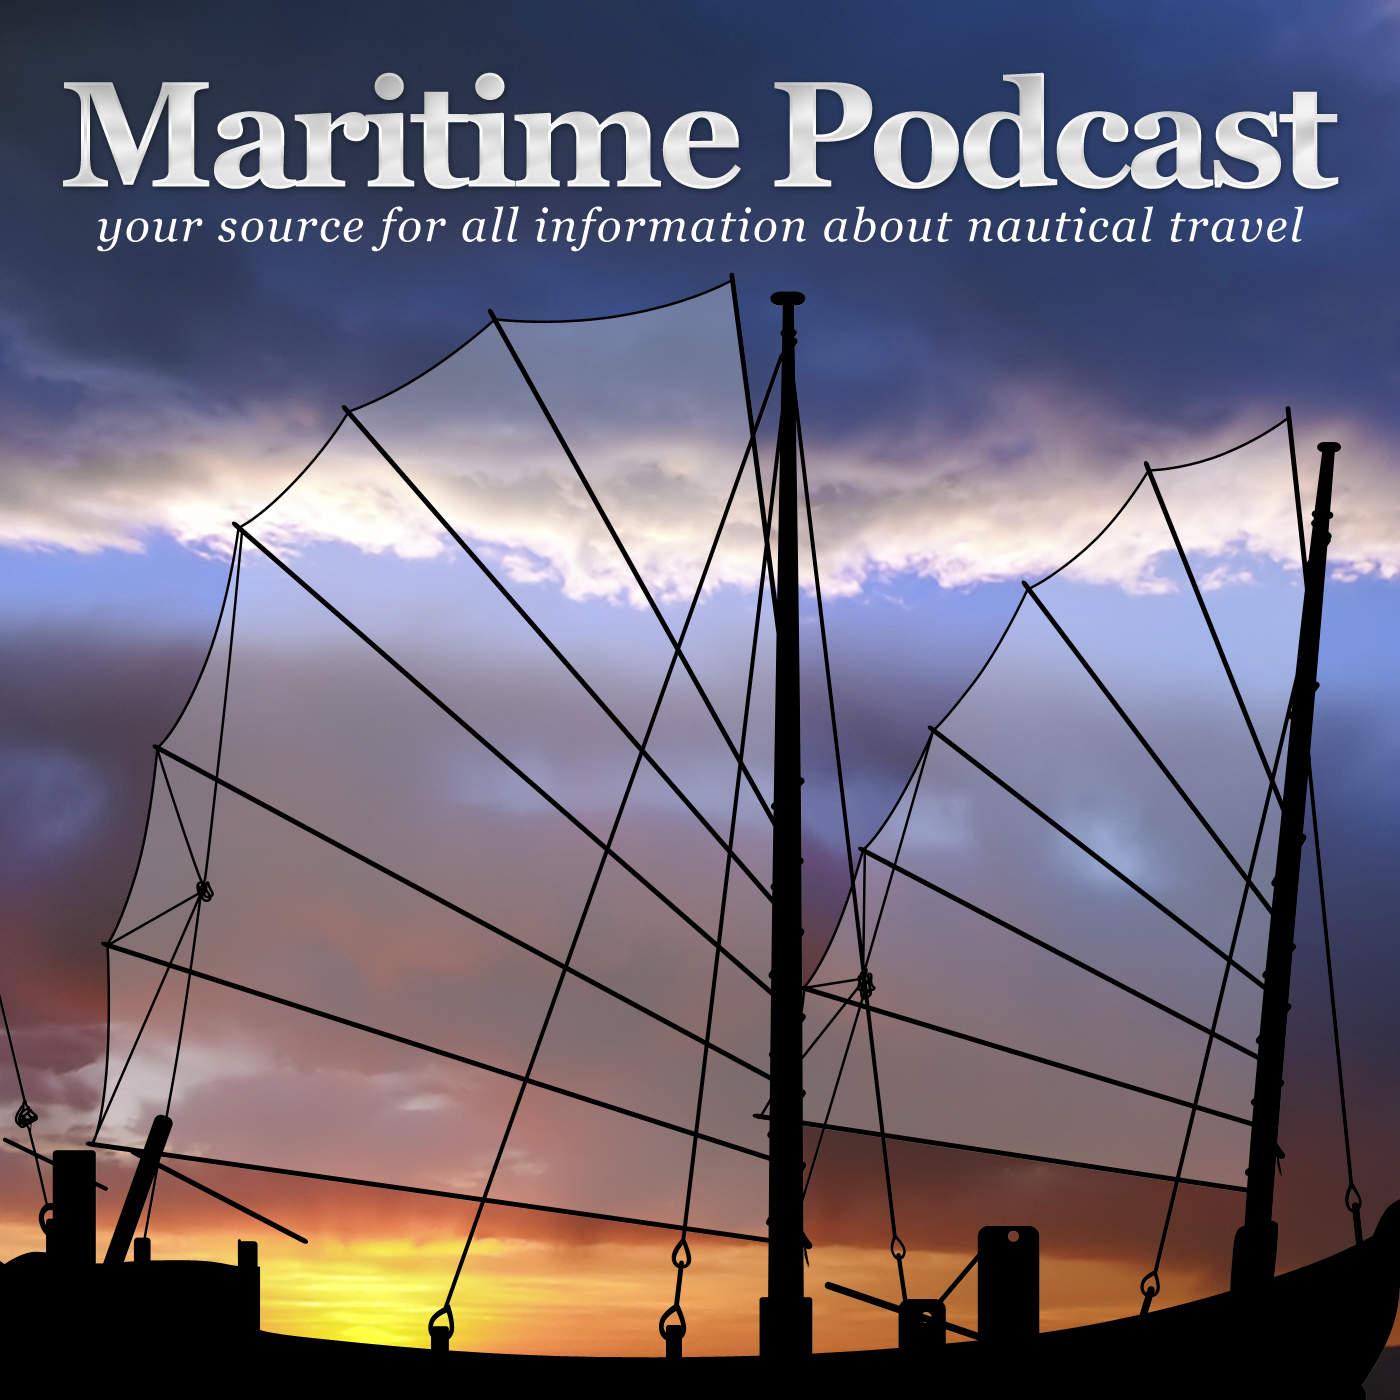 MaritimePodcast